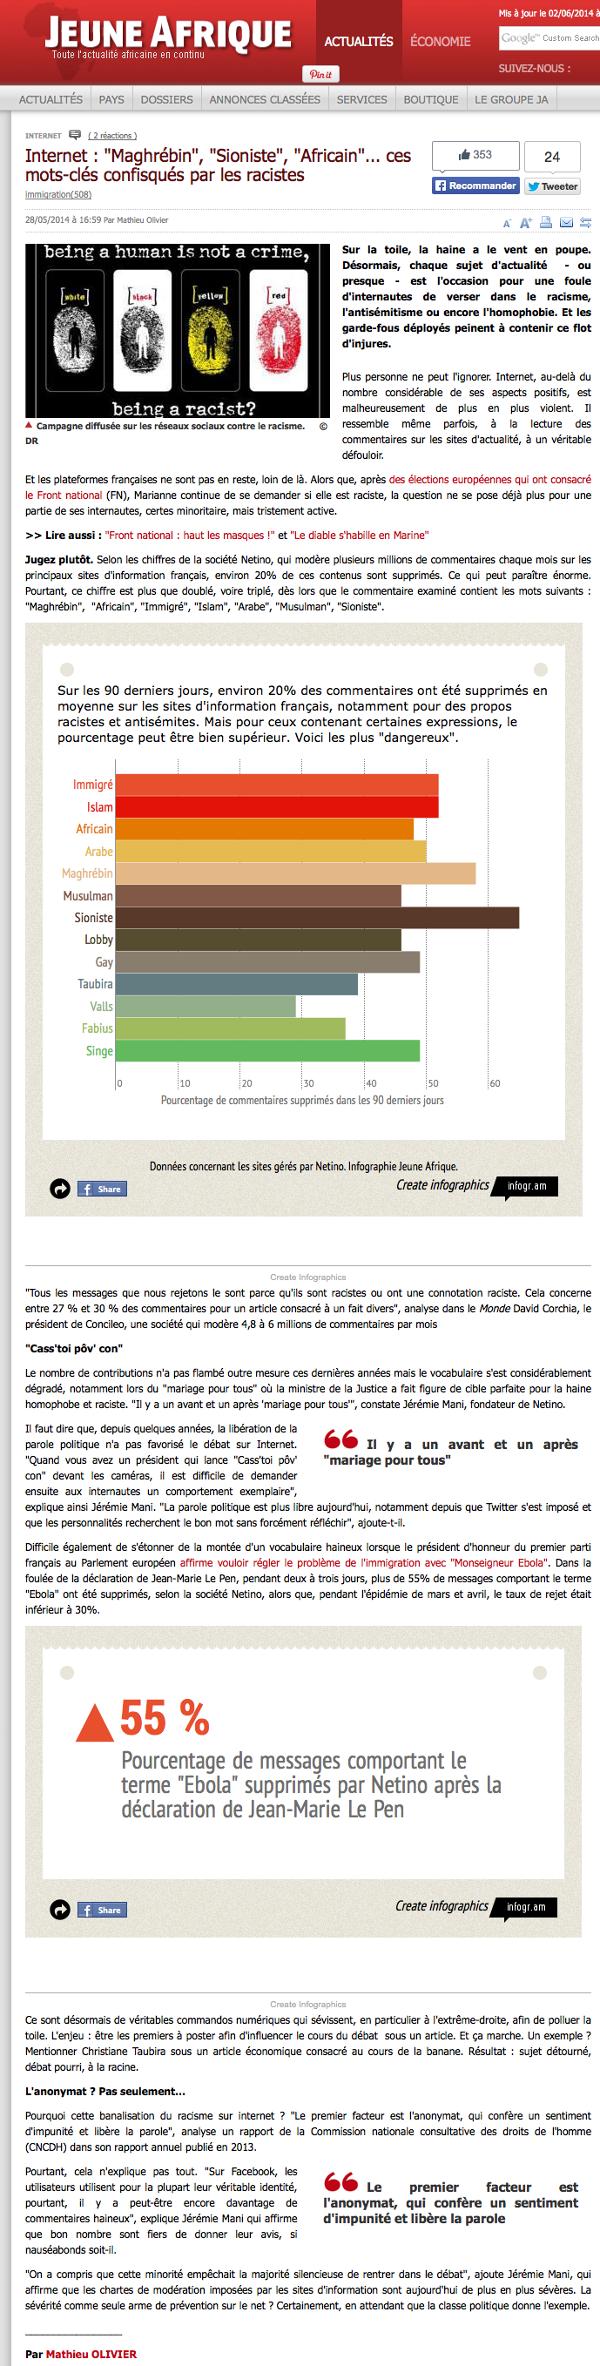 jeune-afrique-internet-maghrebin-sioniste-africain-racistes